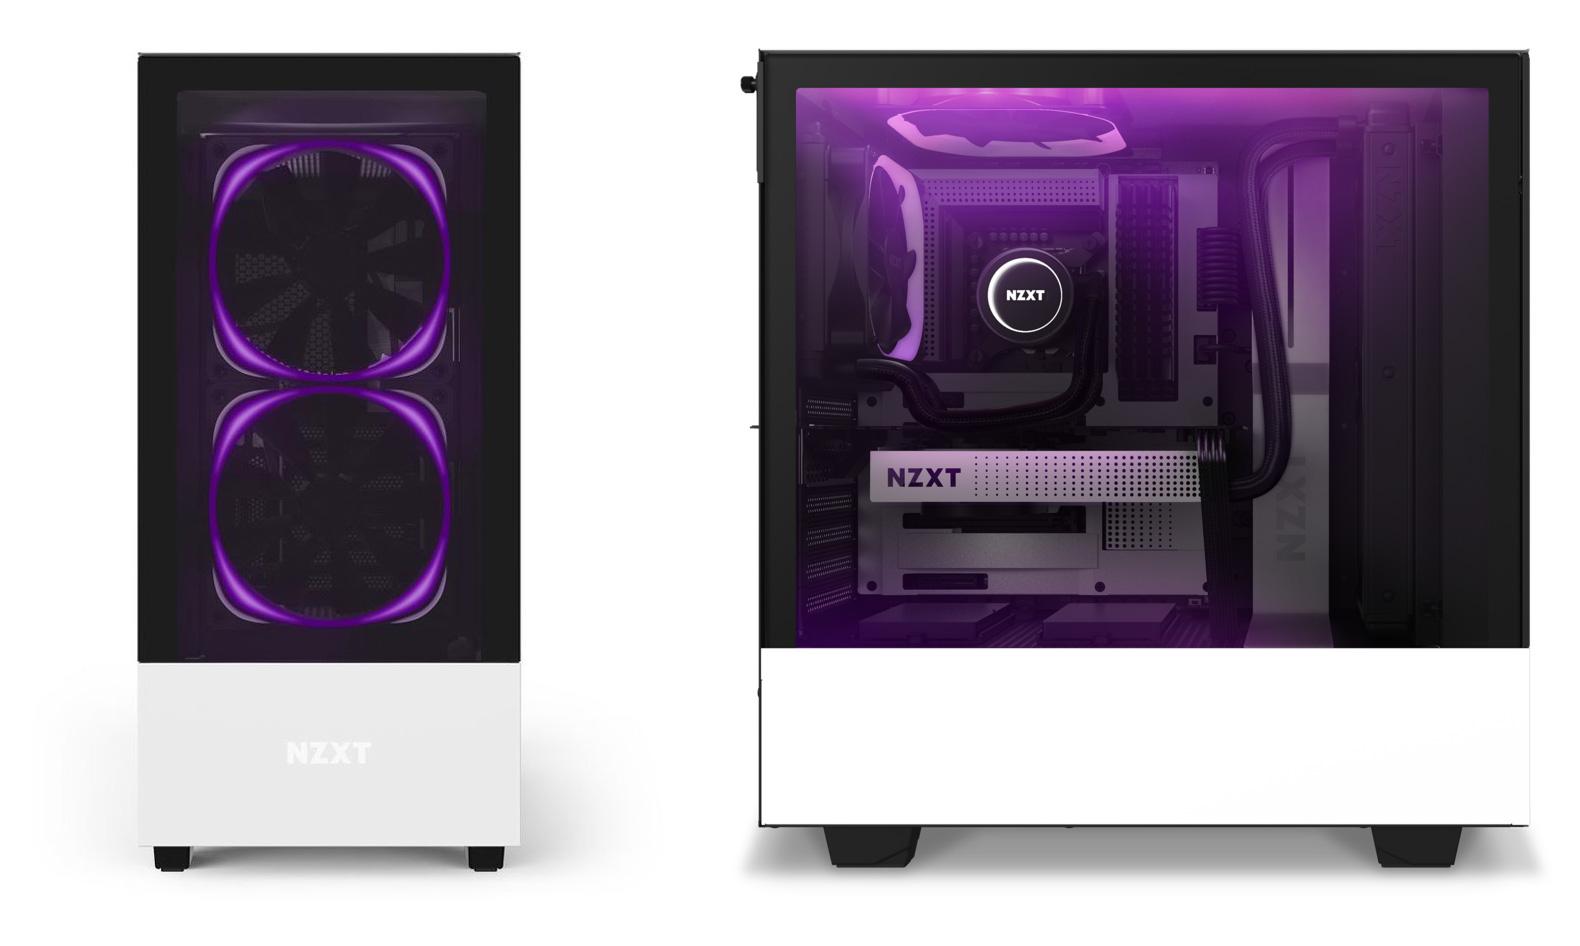 CONFIGURAZIONE PC GAMING CASE NZXT KRAKEN H510 ELITE